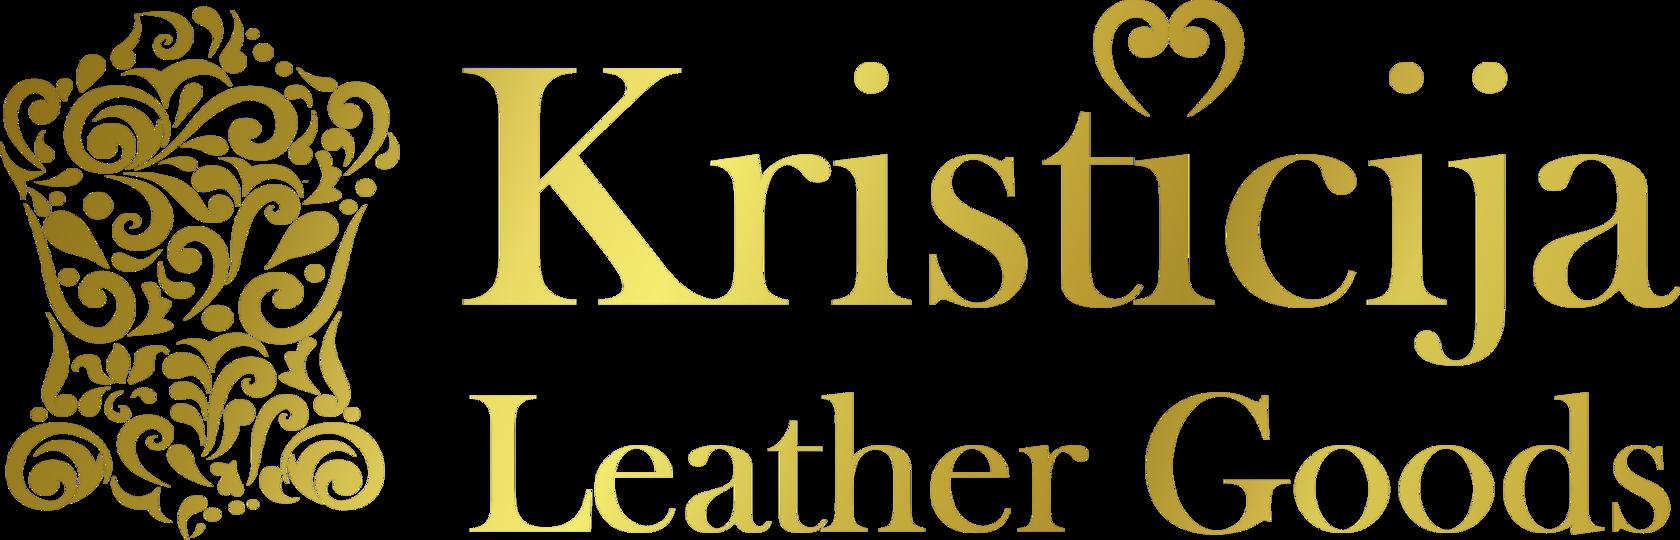 Kristicija Leather Goods